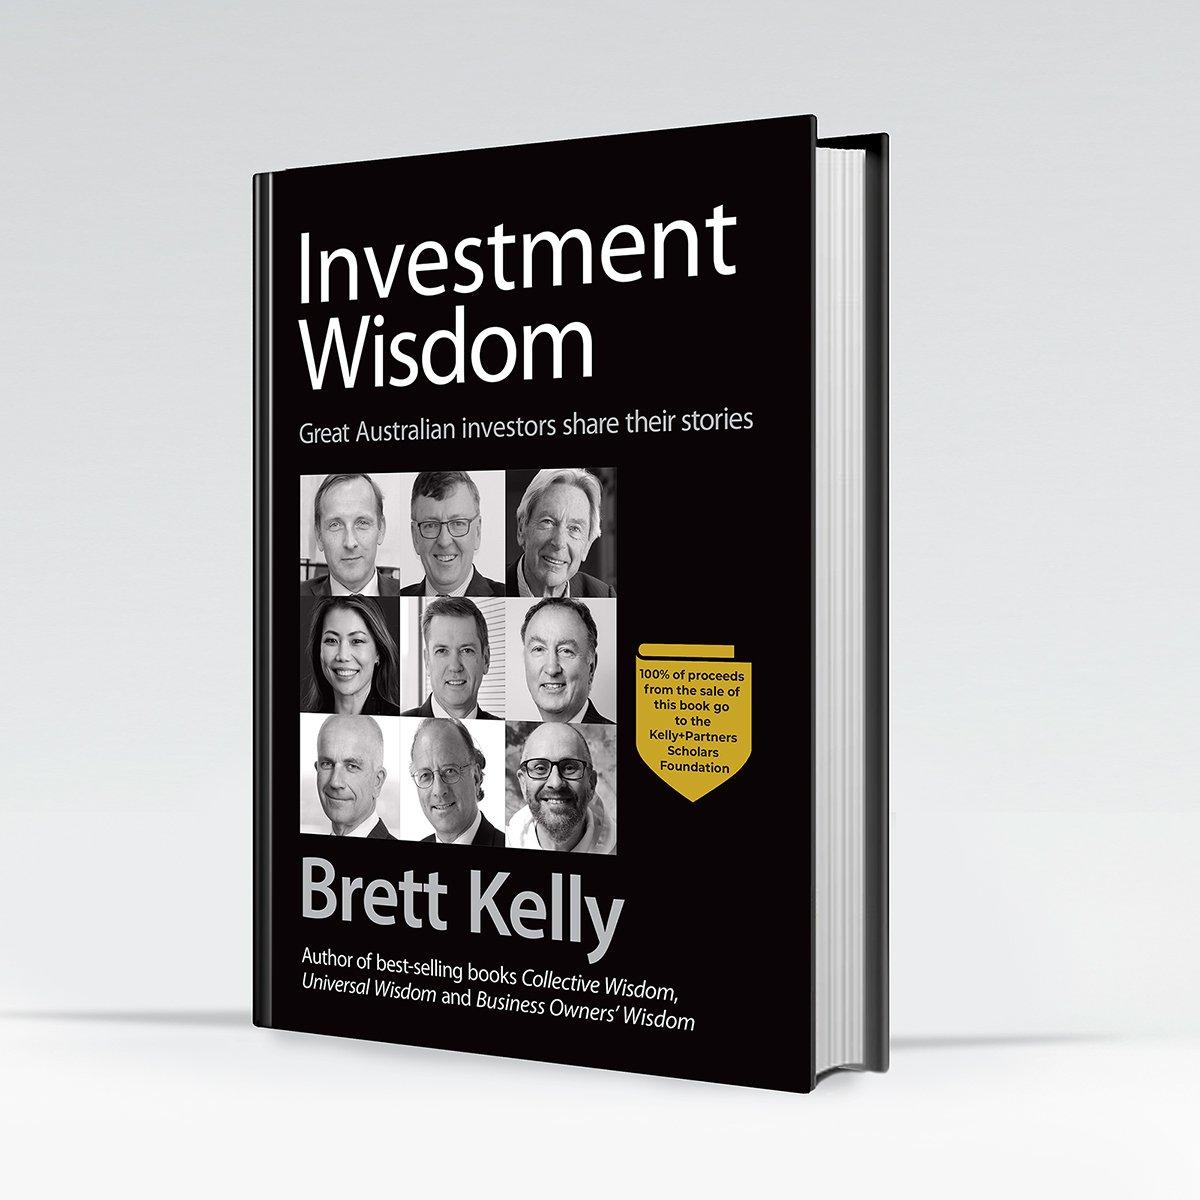 brett-kelly-investment-wisdom